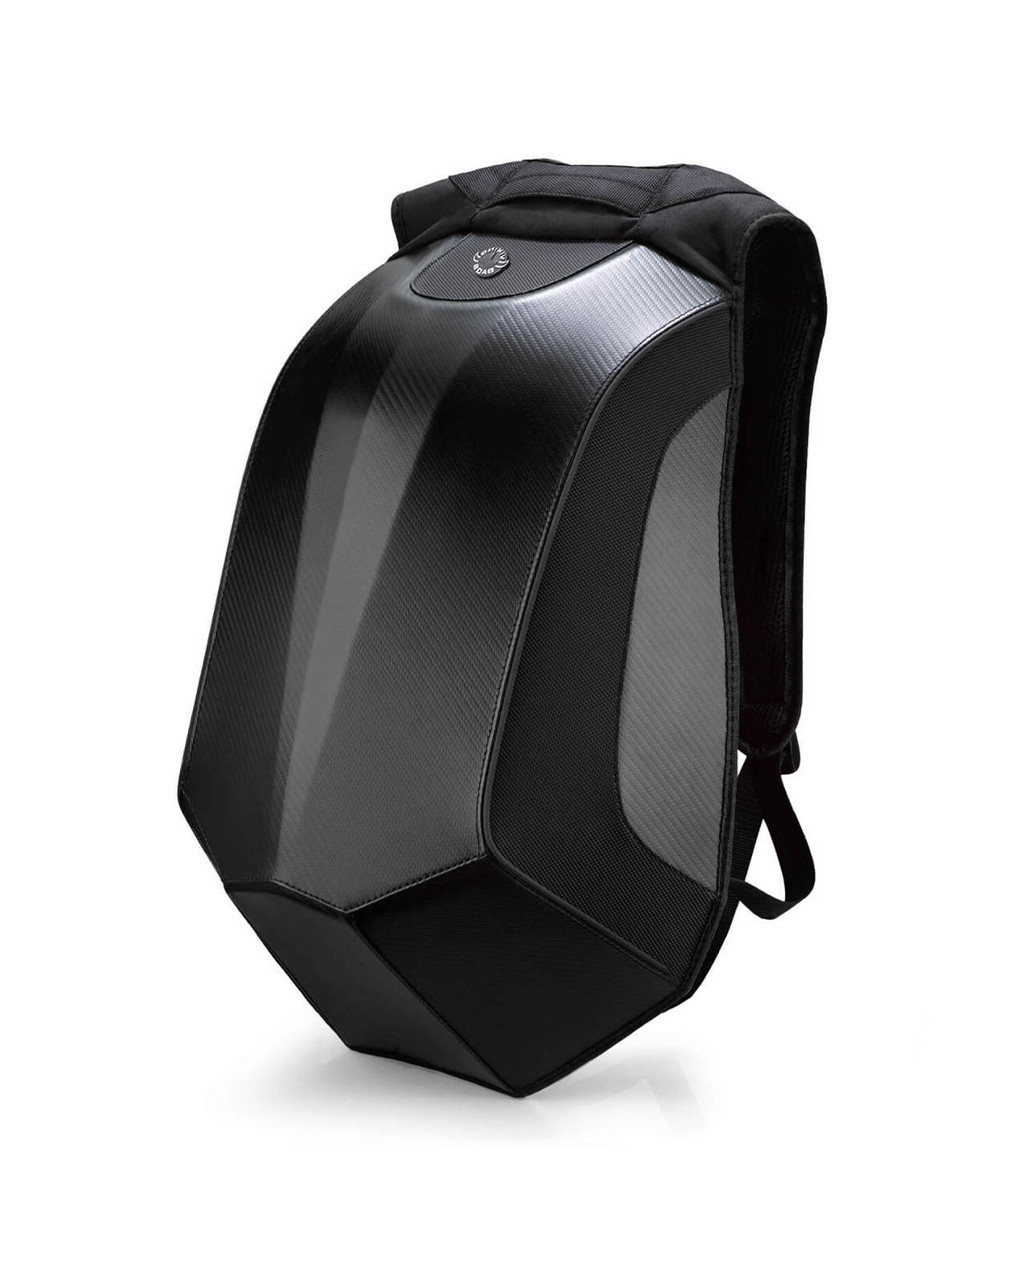 VikingBags Velocity Large Black Expandable Triumph Motorcycle Backpack Main Bag View